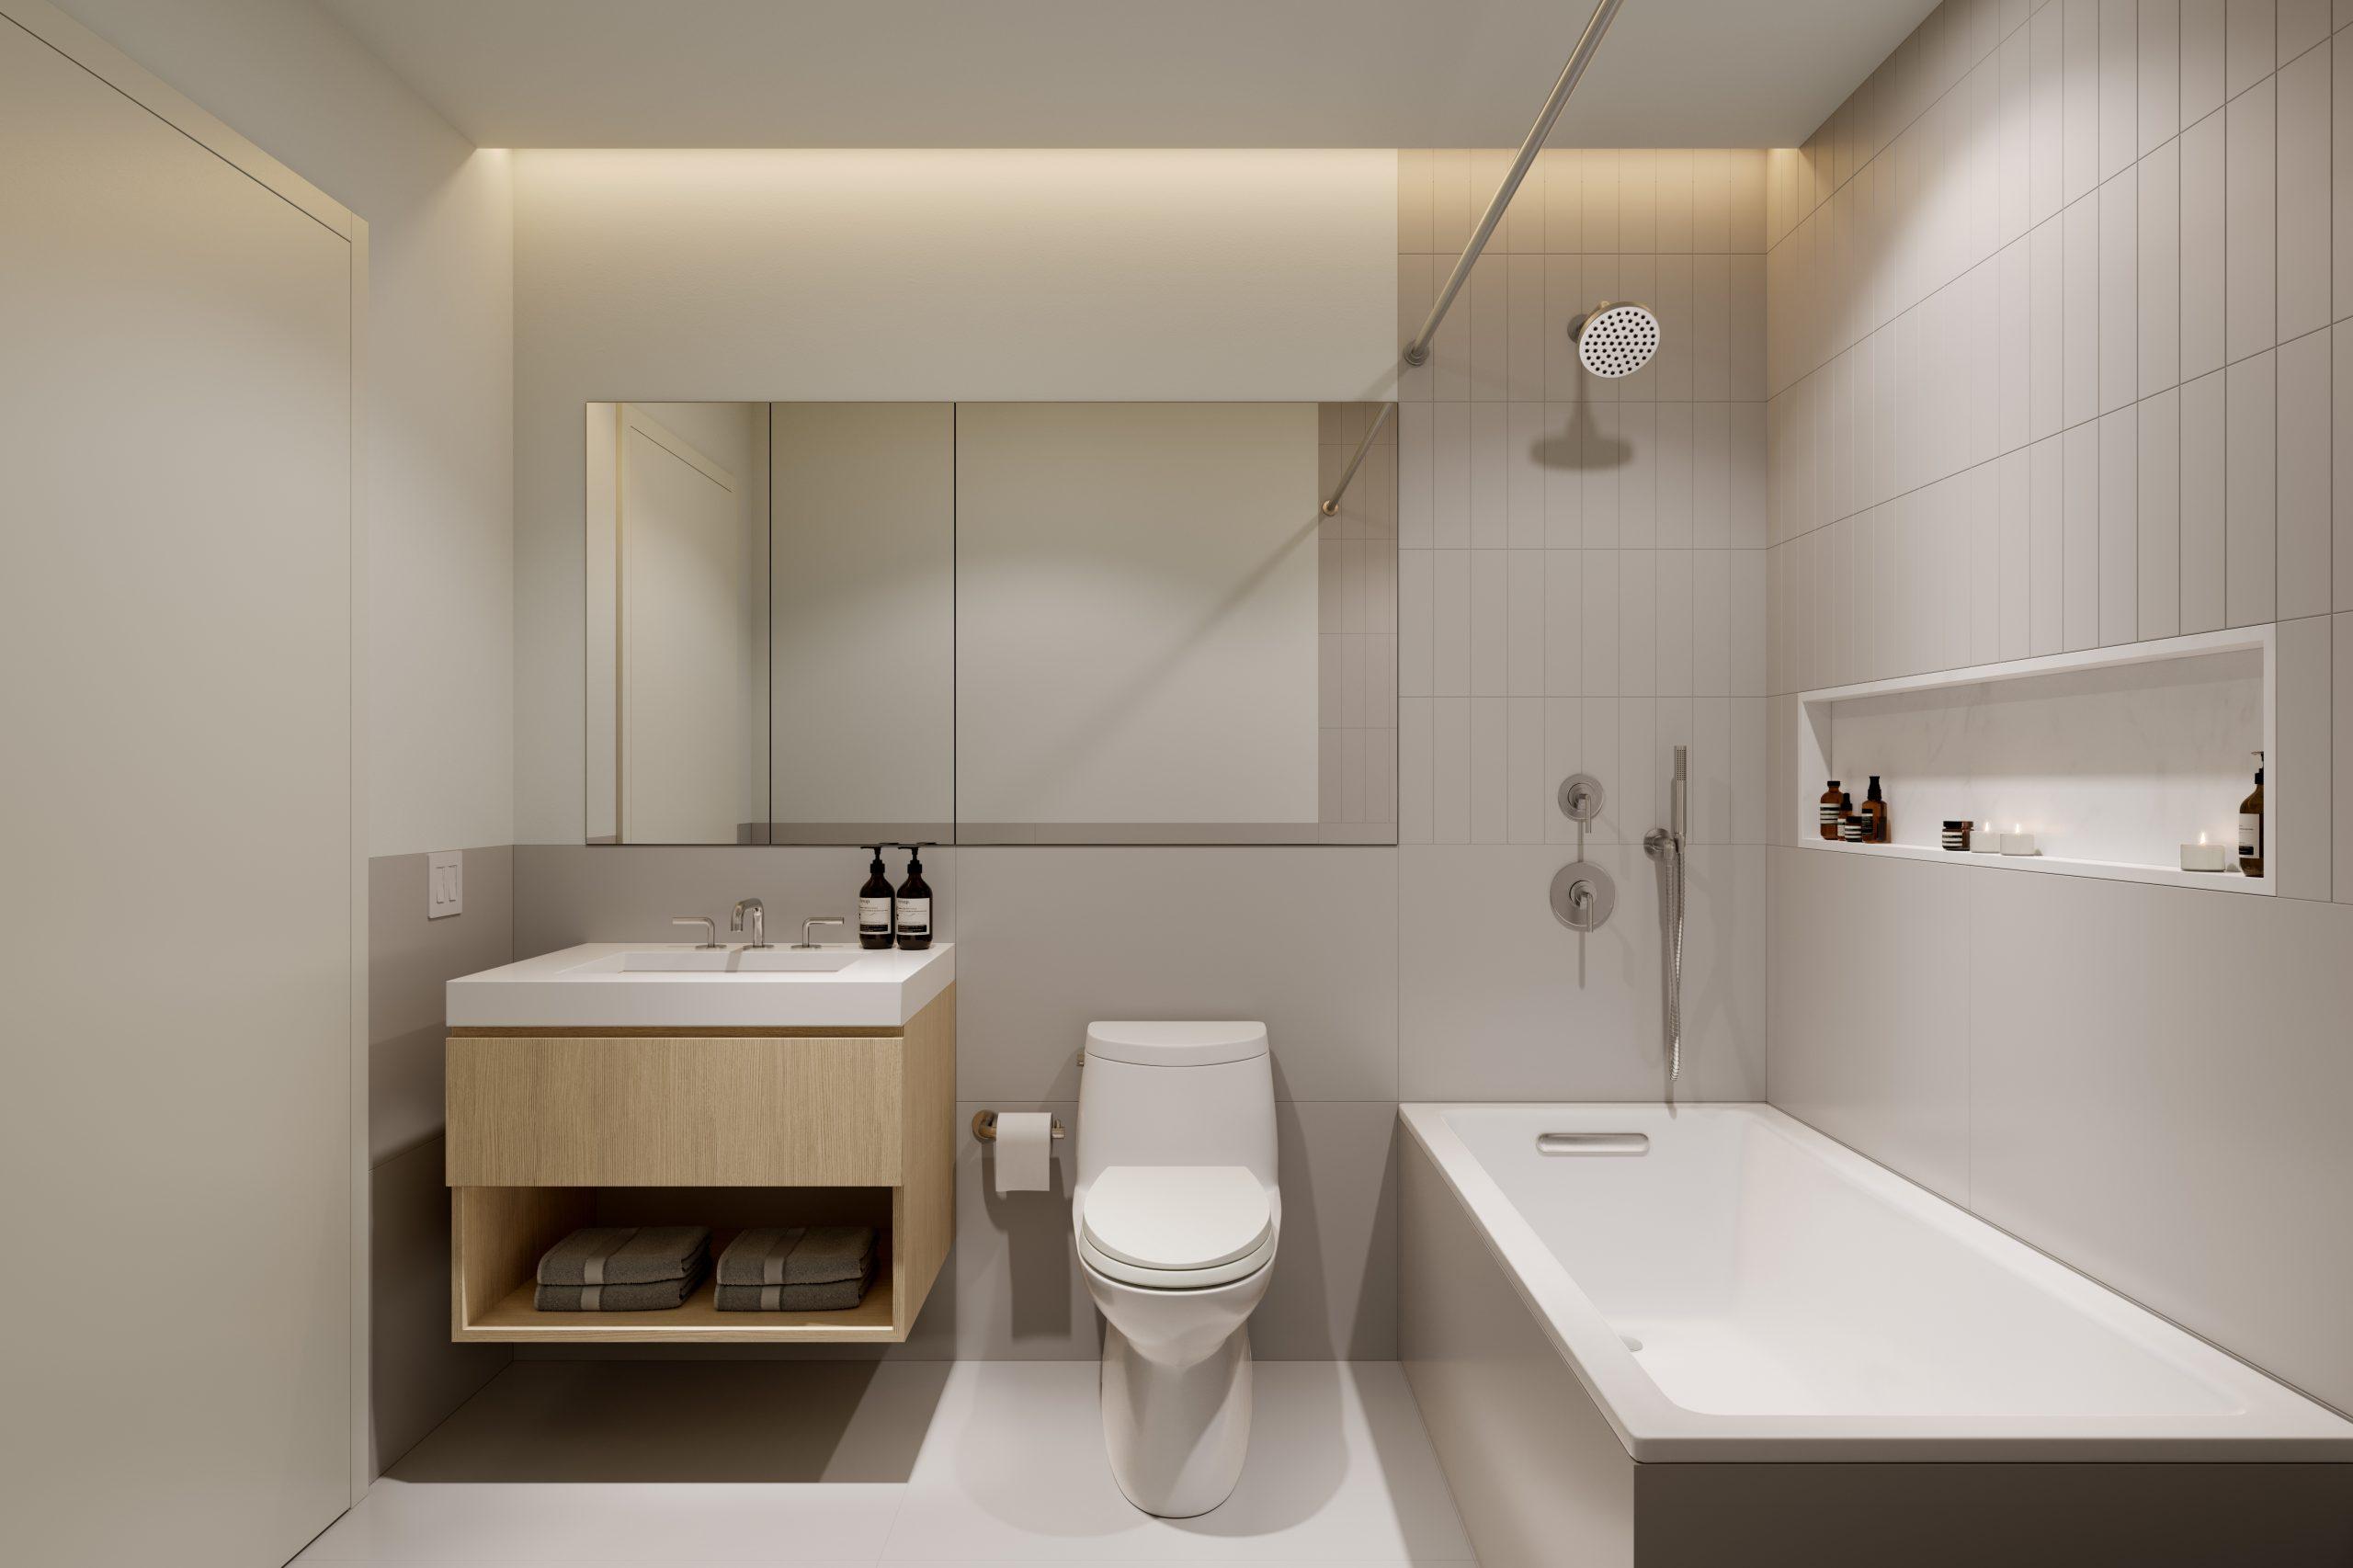 413 E 50th St Master Bathroom